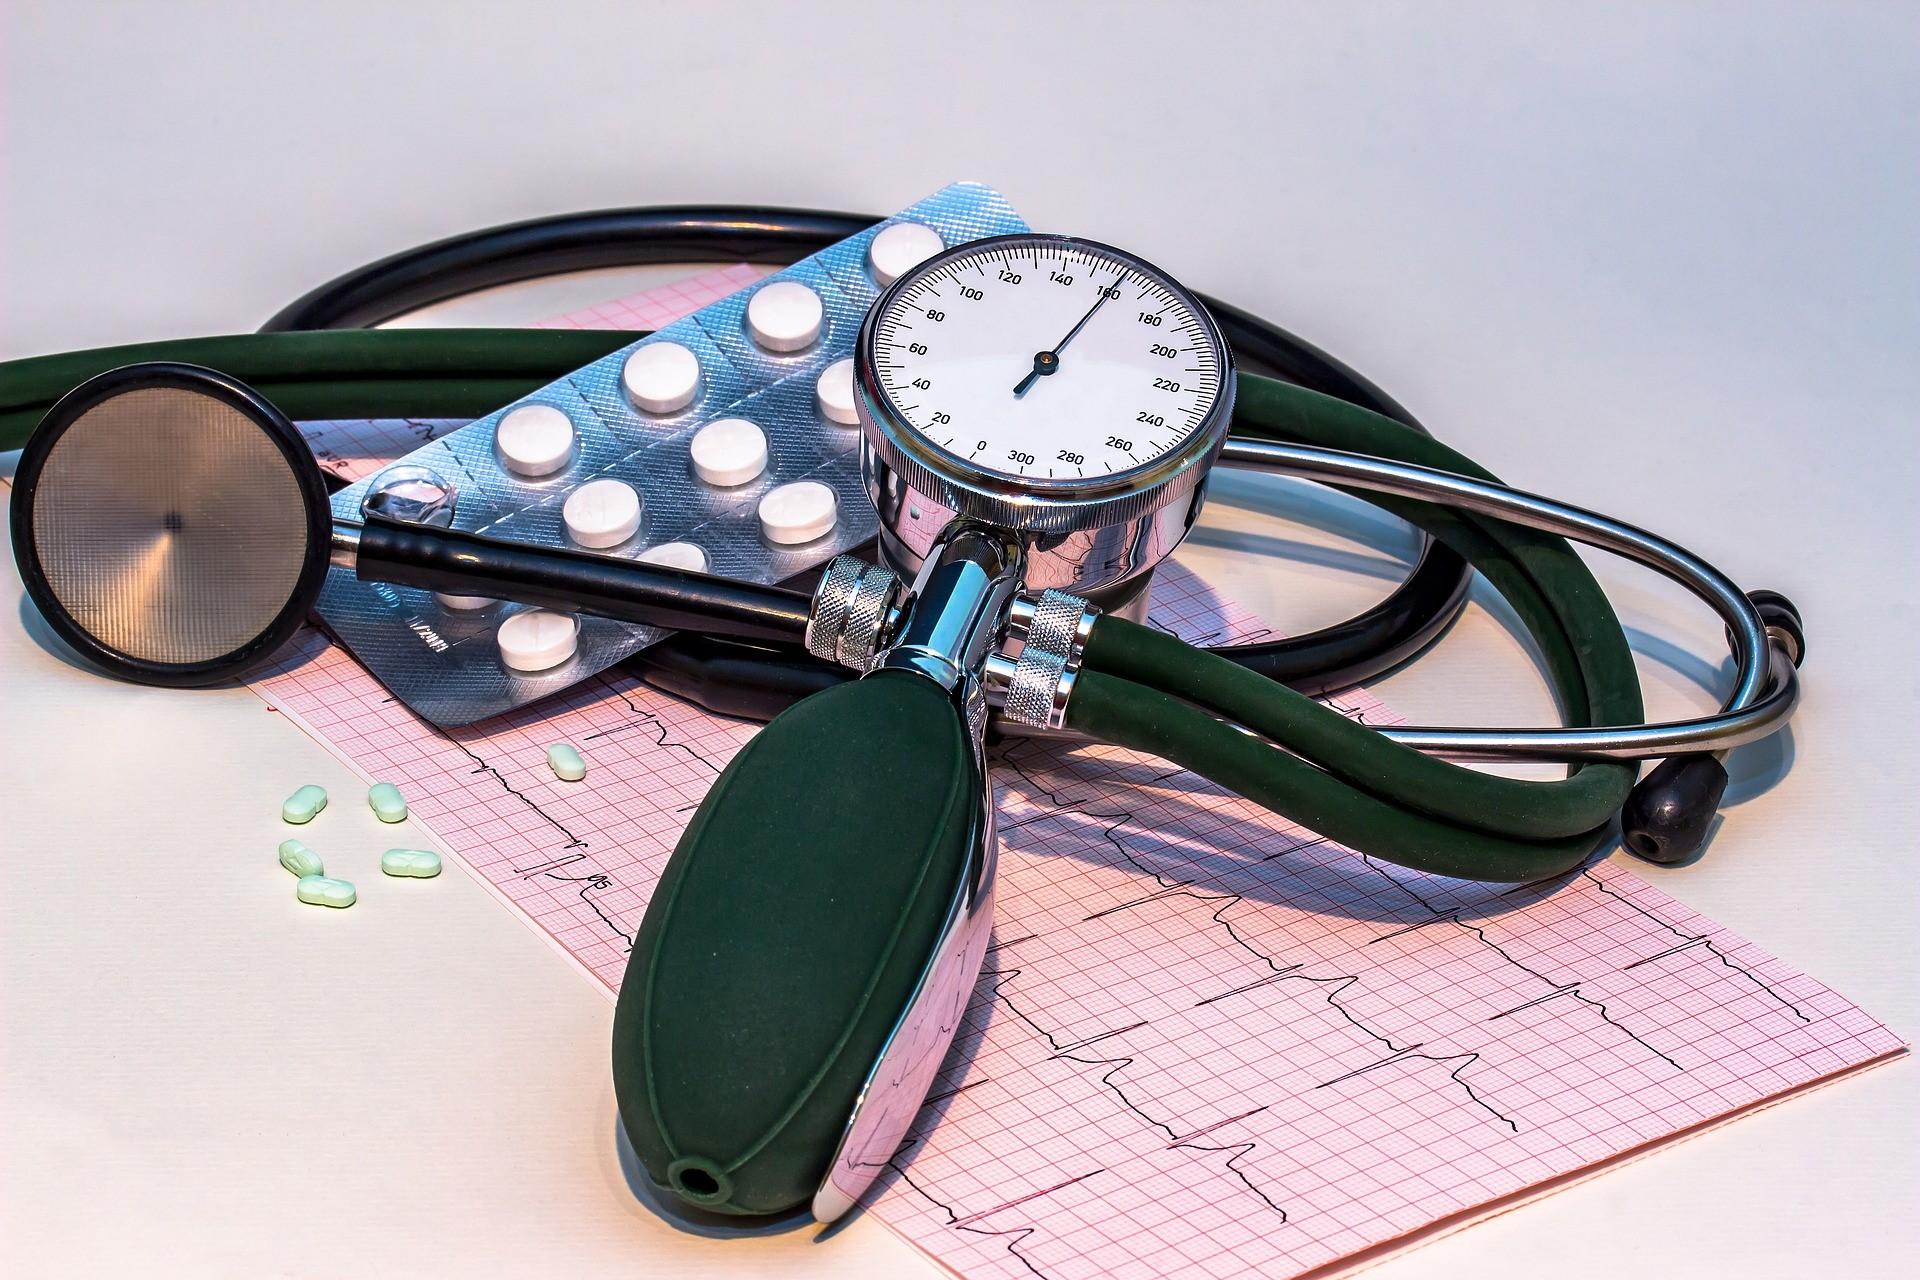 hipertenzija ir jos komplikacijos hipotenzija ir sportininkų hipertenzija